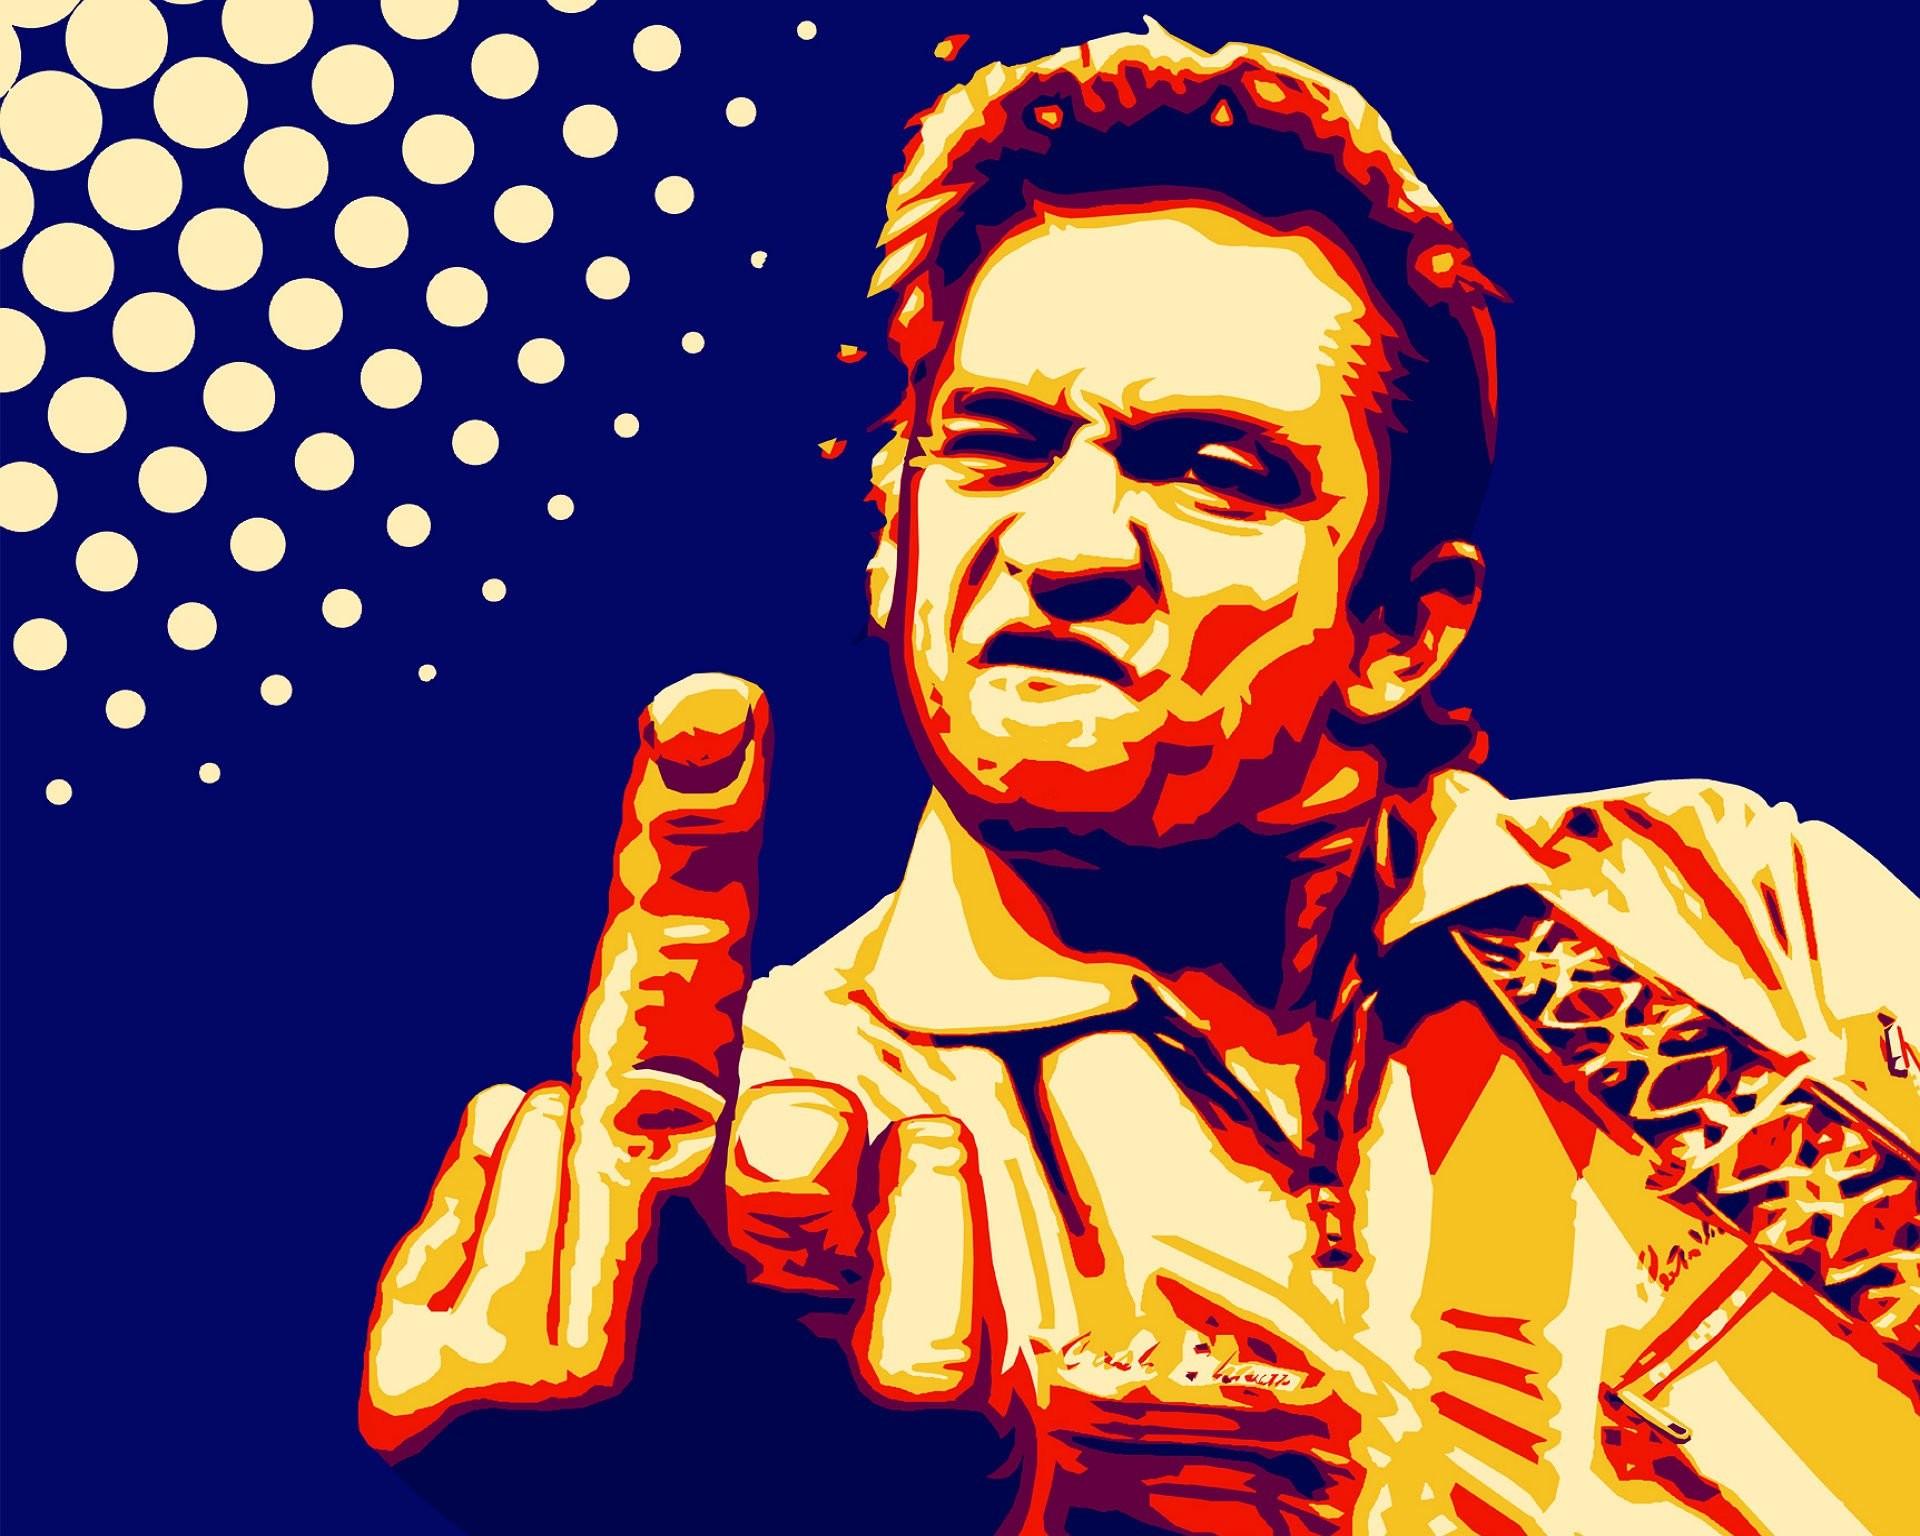 Res: 1920x1536, JOHNNY CASH countrywestern country western blues singer 1jcash actor folk  rockabilly gospel rock roll finger sadic wallpaper |  | 635236 |  ...